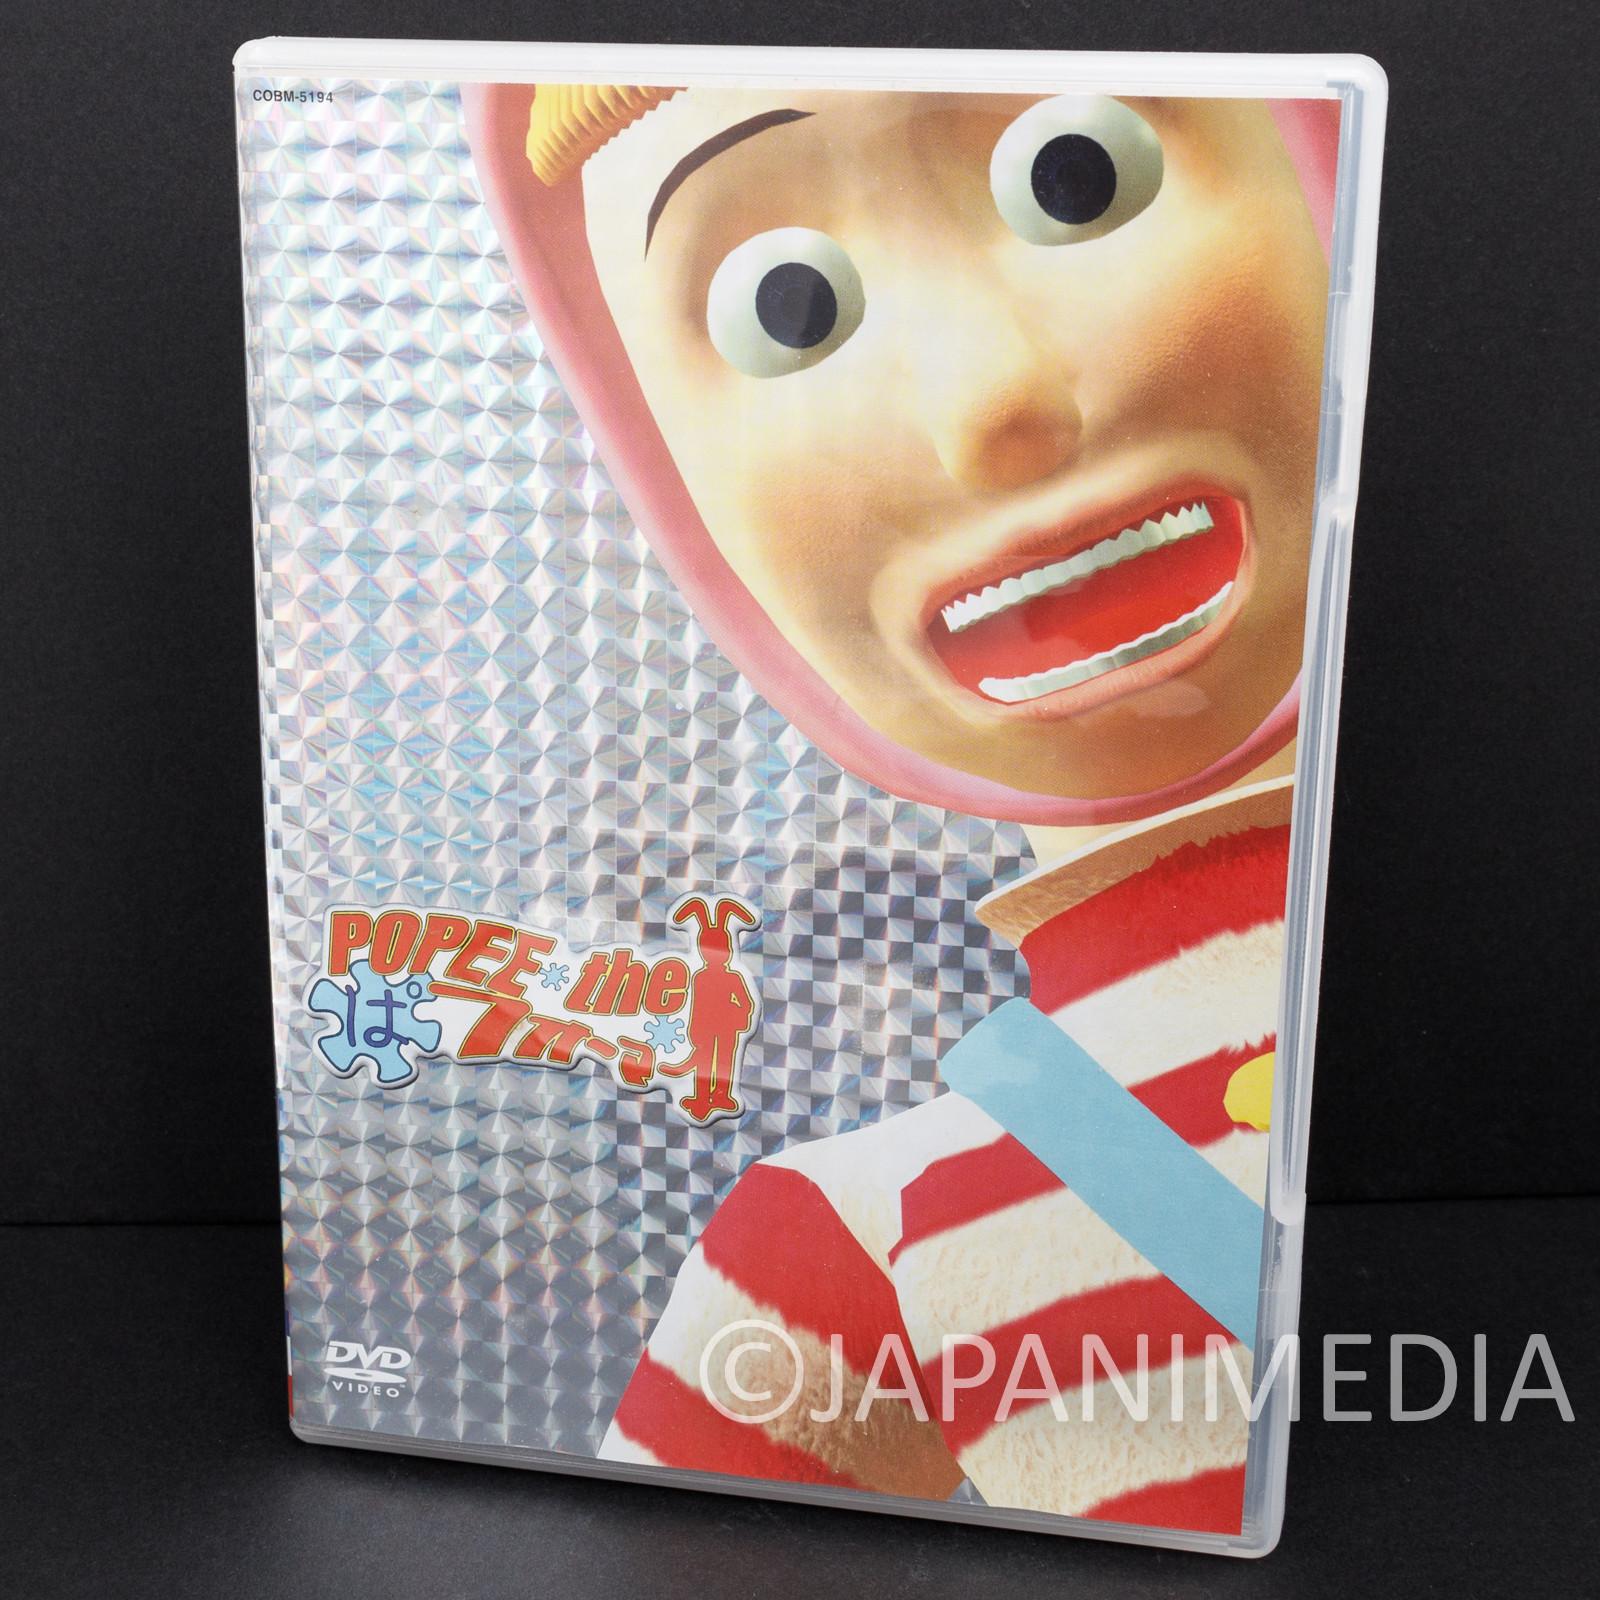 Popee the Performer DVD Vol.01 ep1-13 COBM-5194 JAPAN ANIME